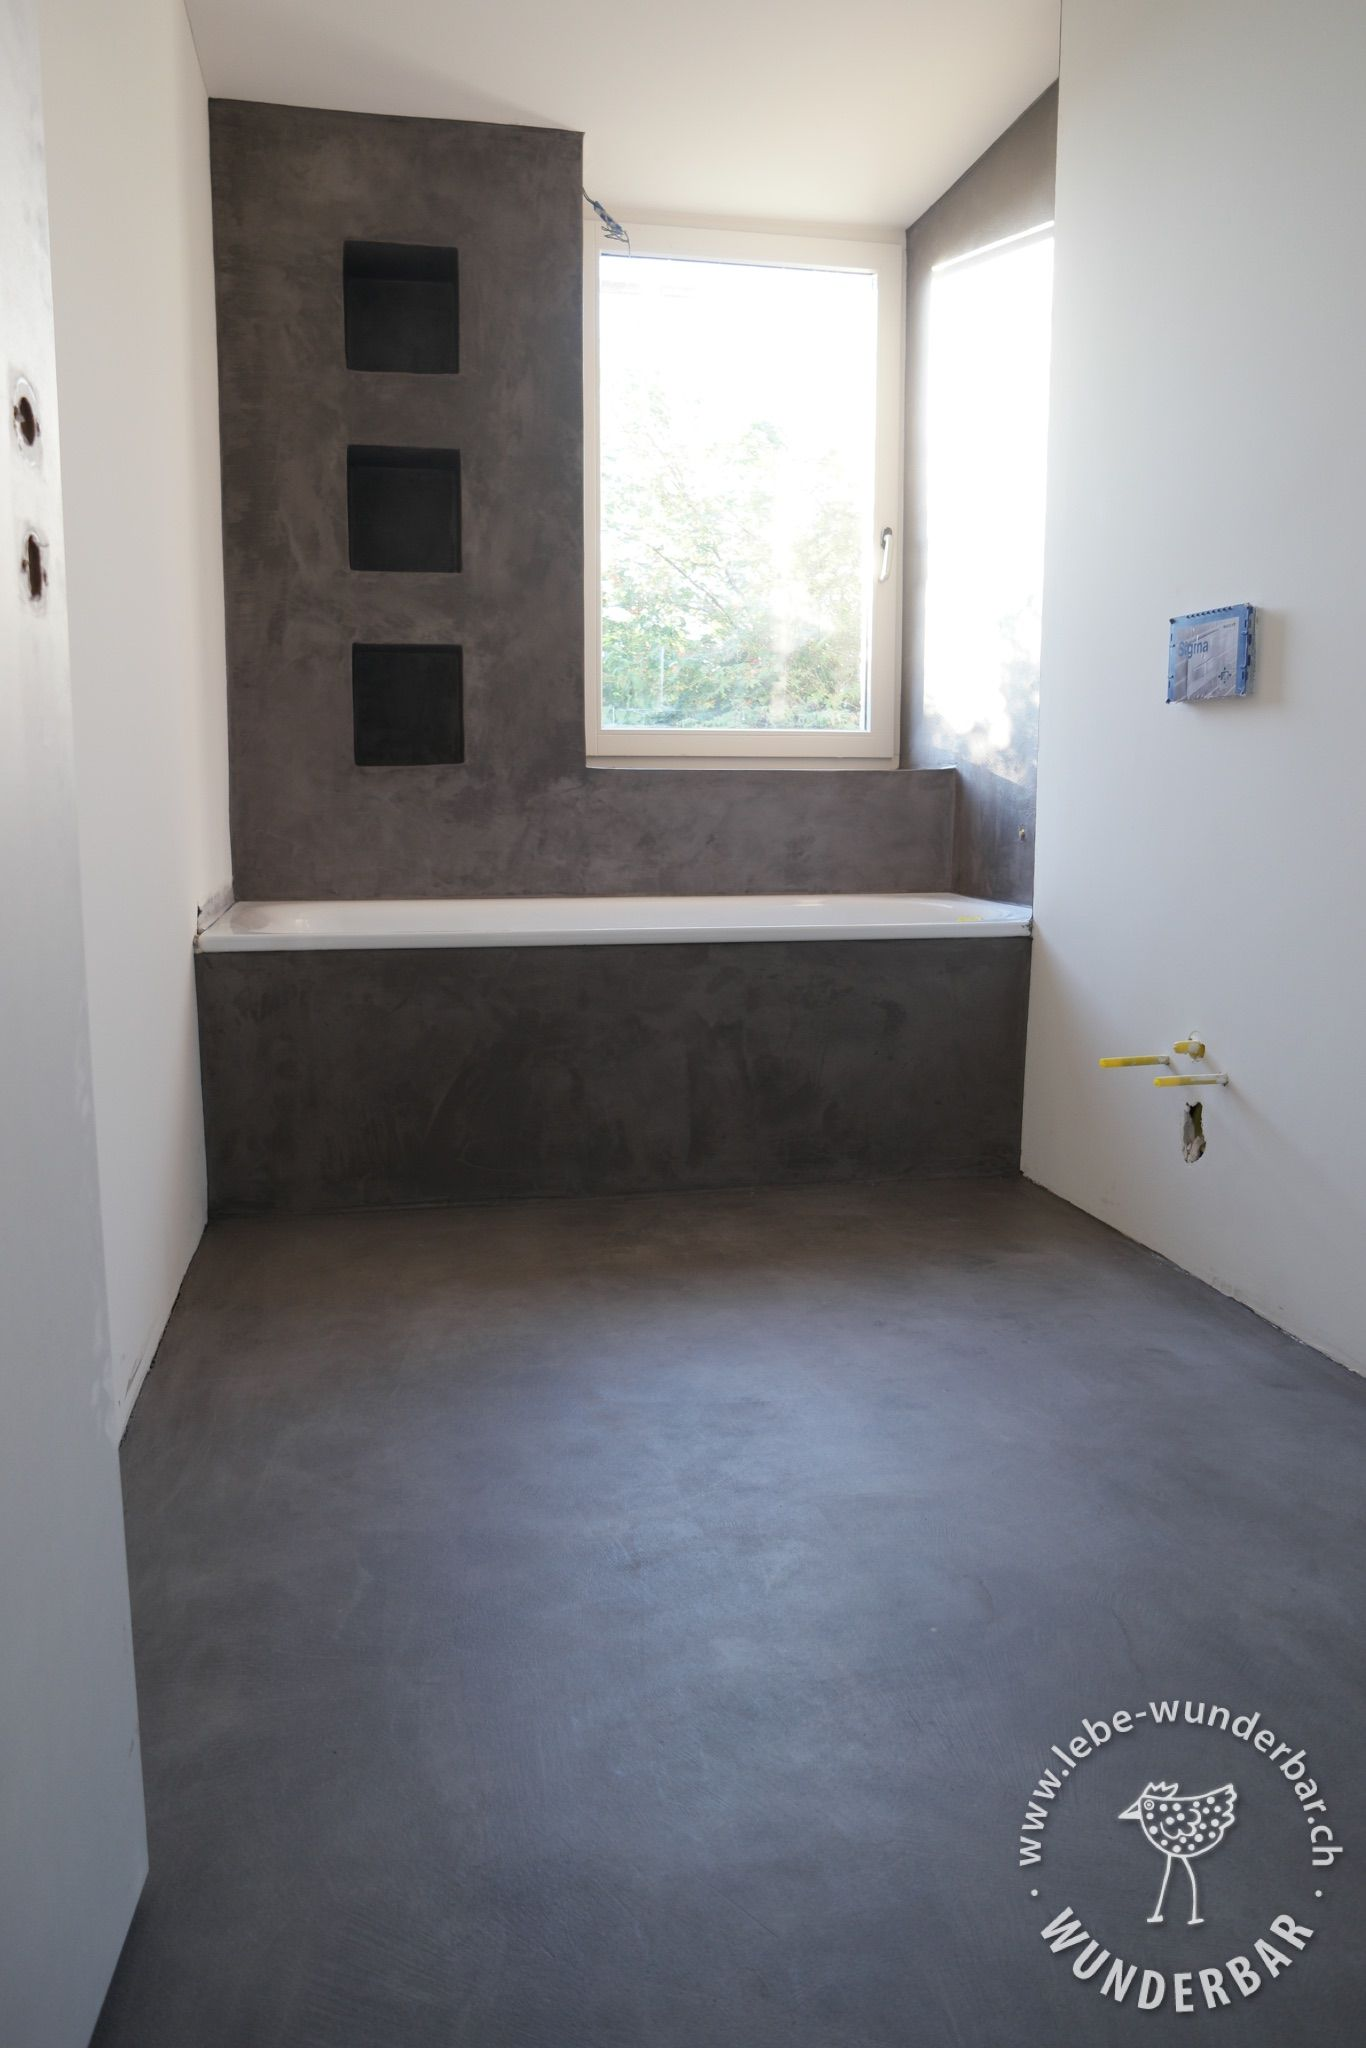 Haussanierung Mineralischer Wand Bodenbelag Bodenbelag Bad Badezimmer Fugenloses Bad